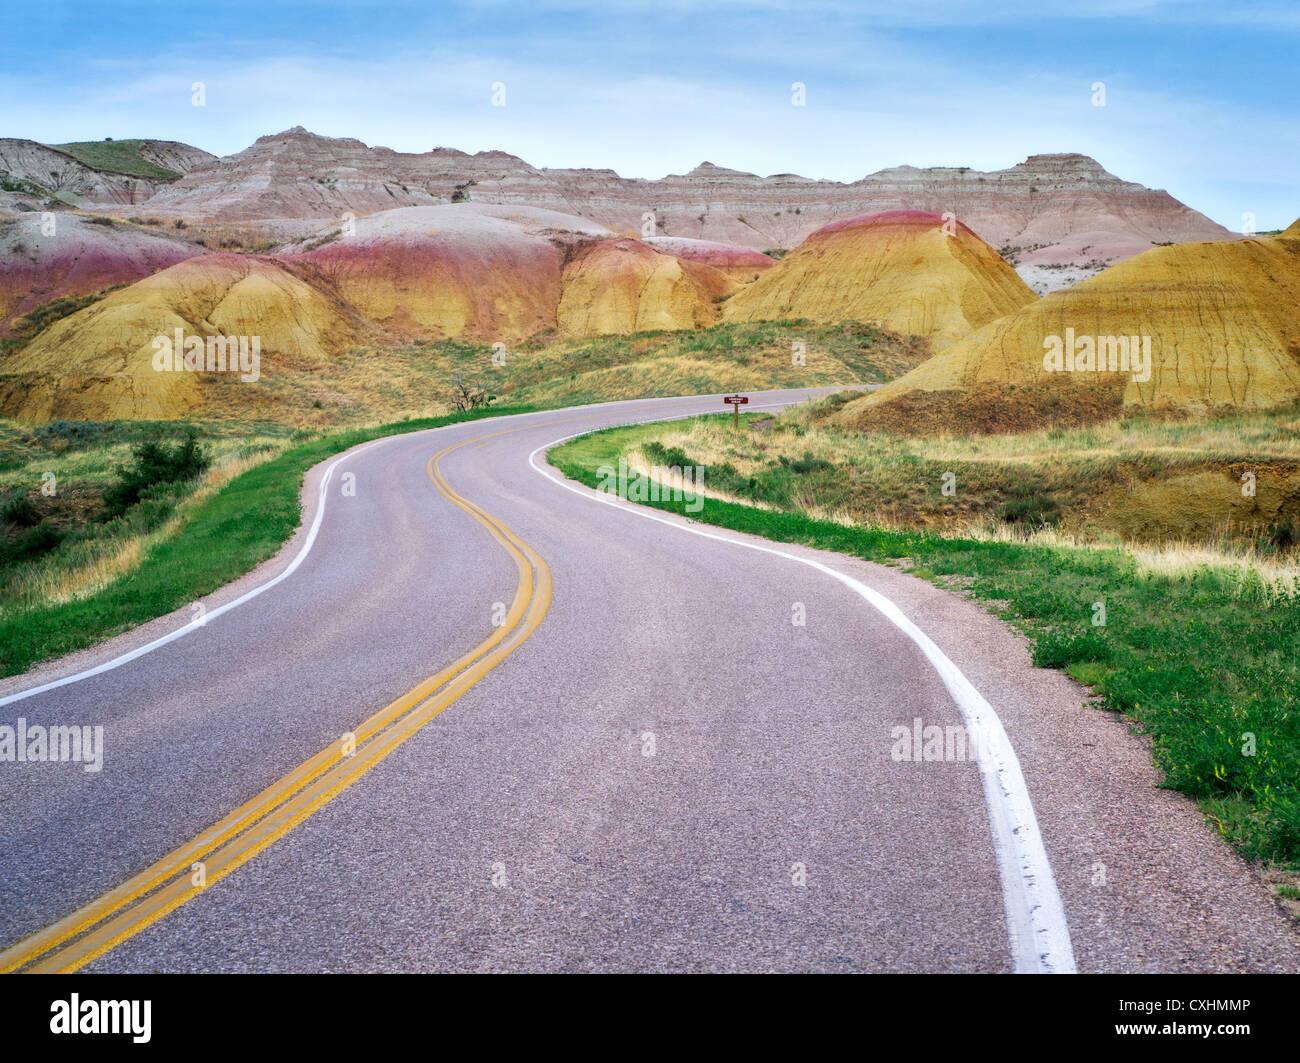 Road in Badlands National Park, South Dakota. - Stock Image